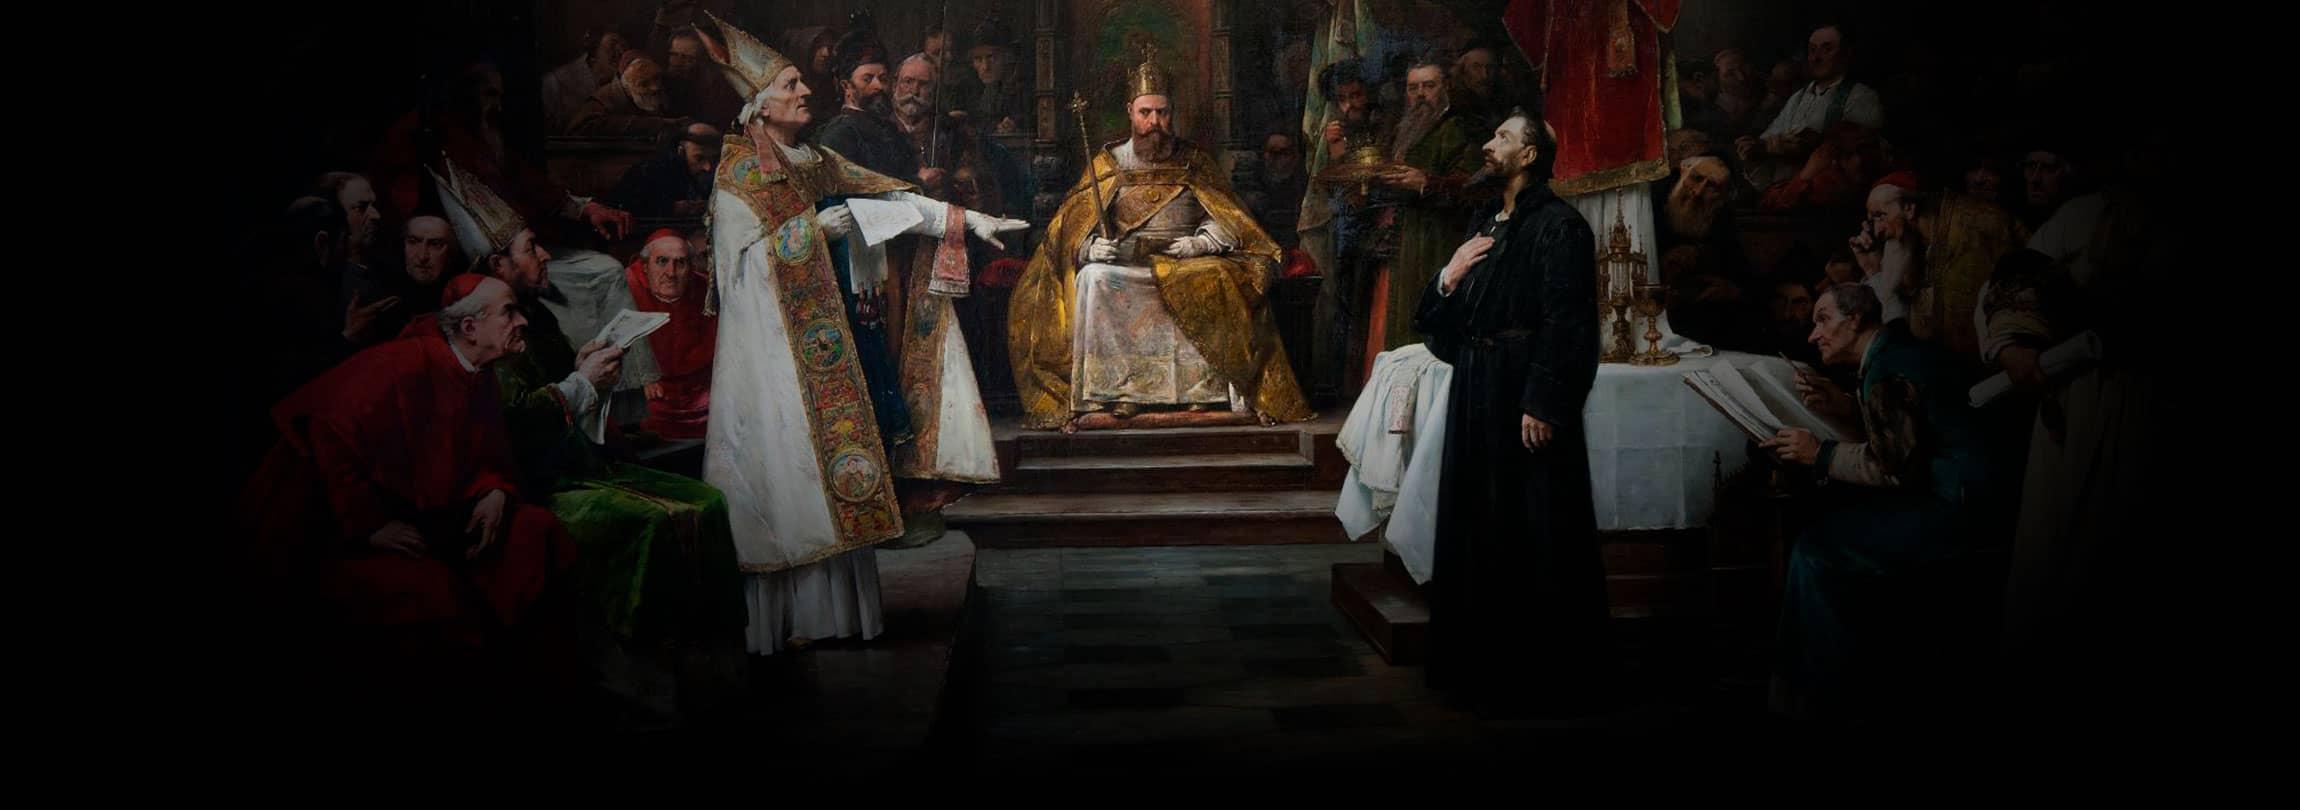 O desastre do catolicismo liberal